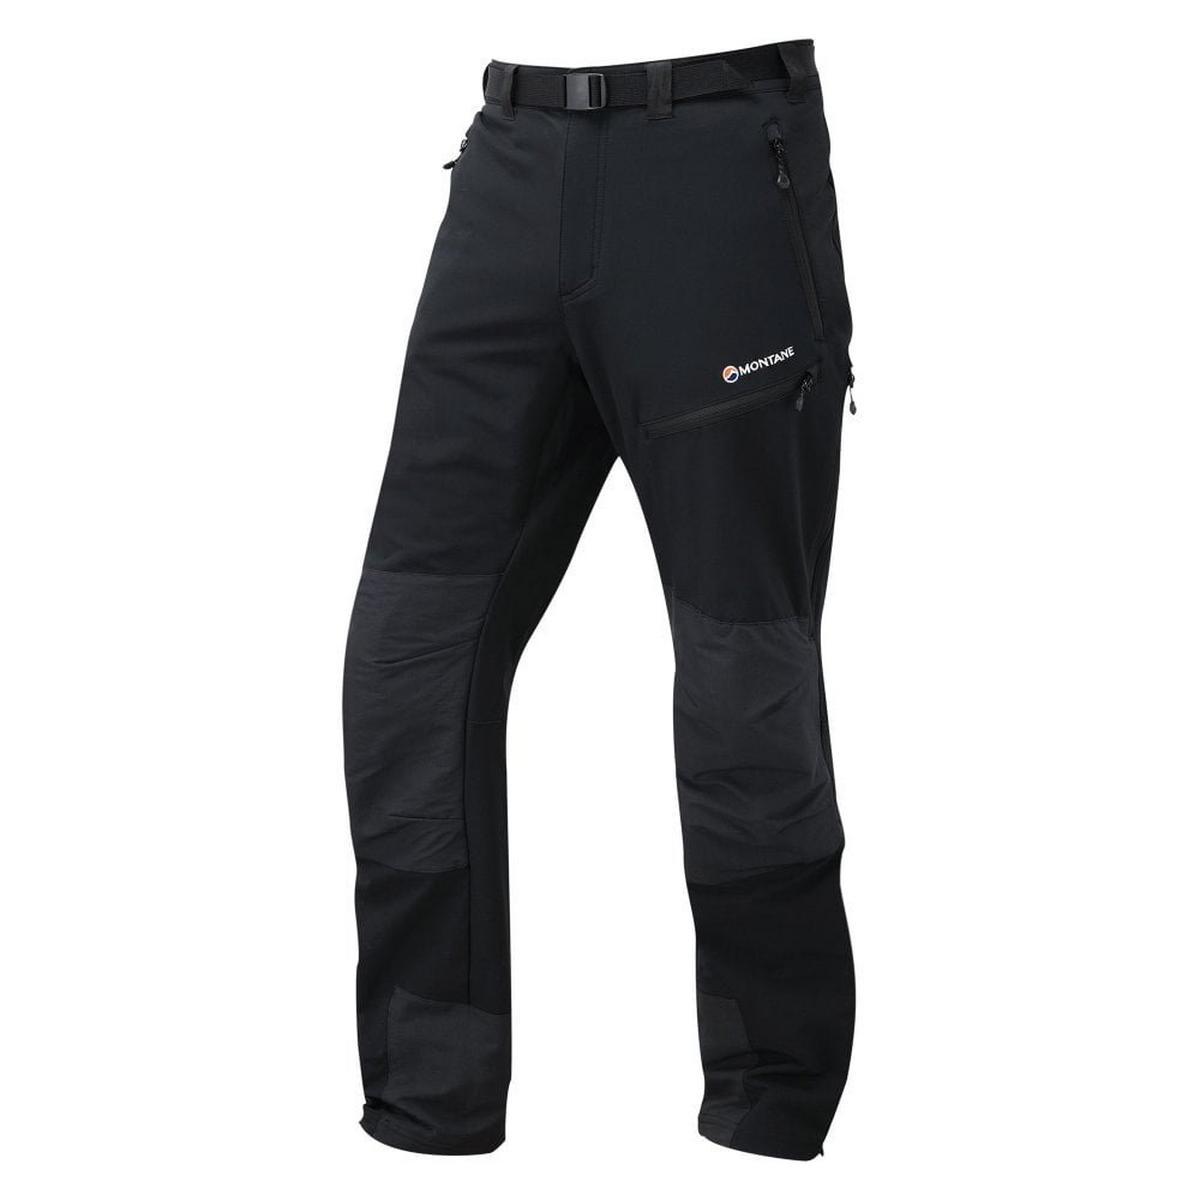 Montane Men's Terra Mission Pant Long - Black